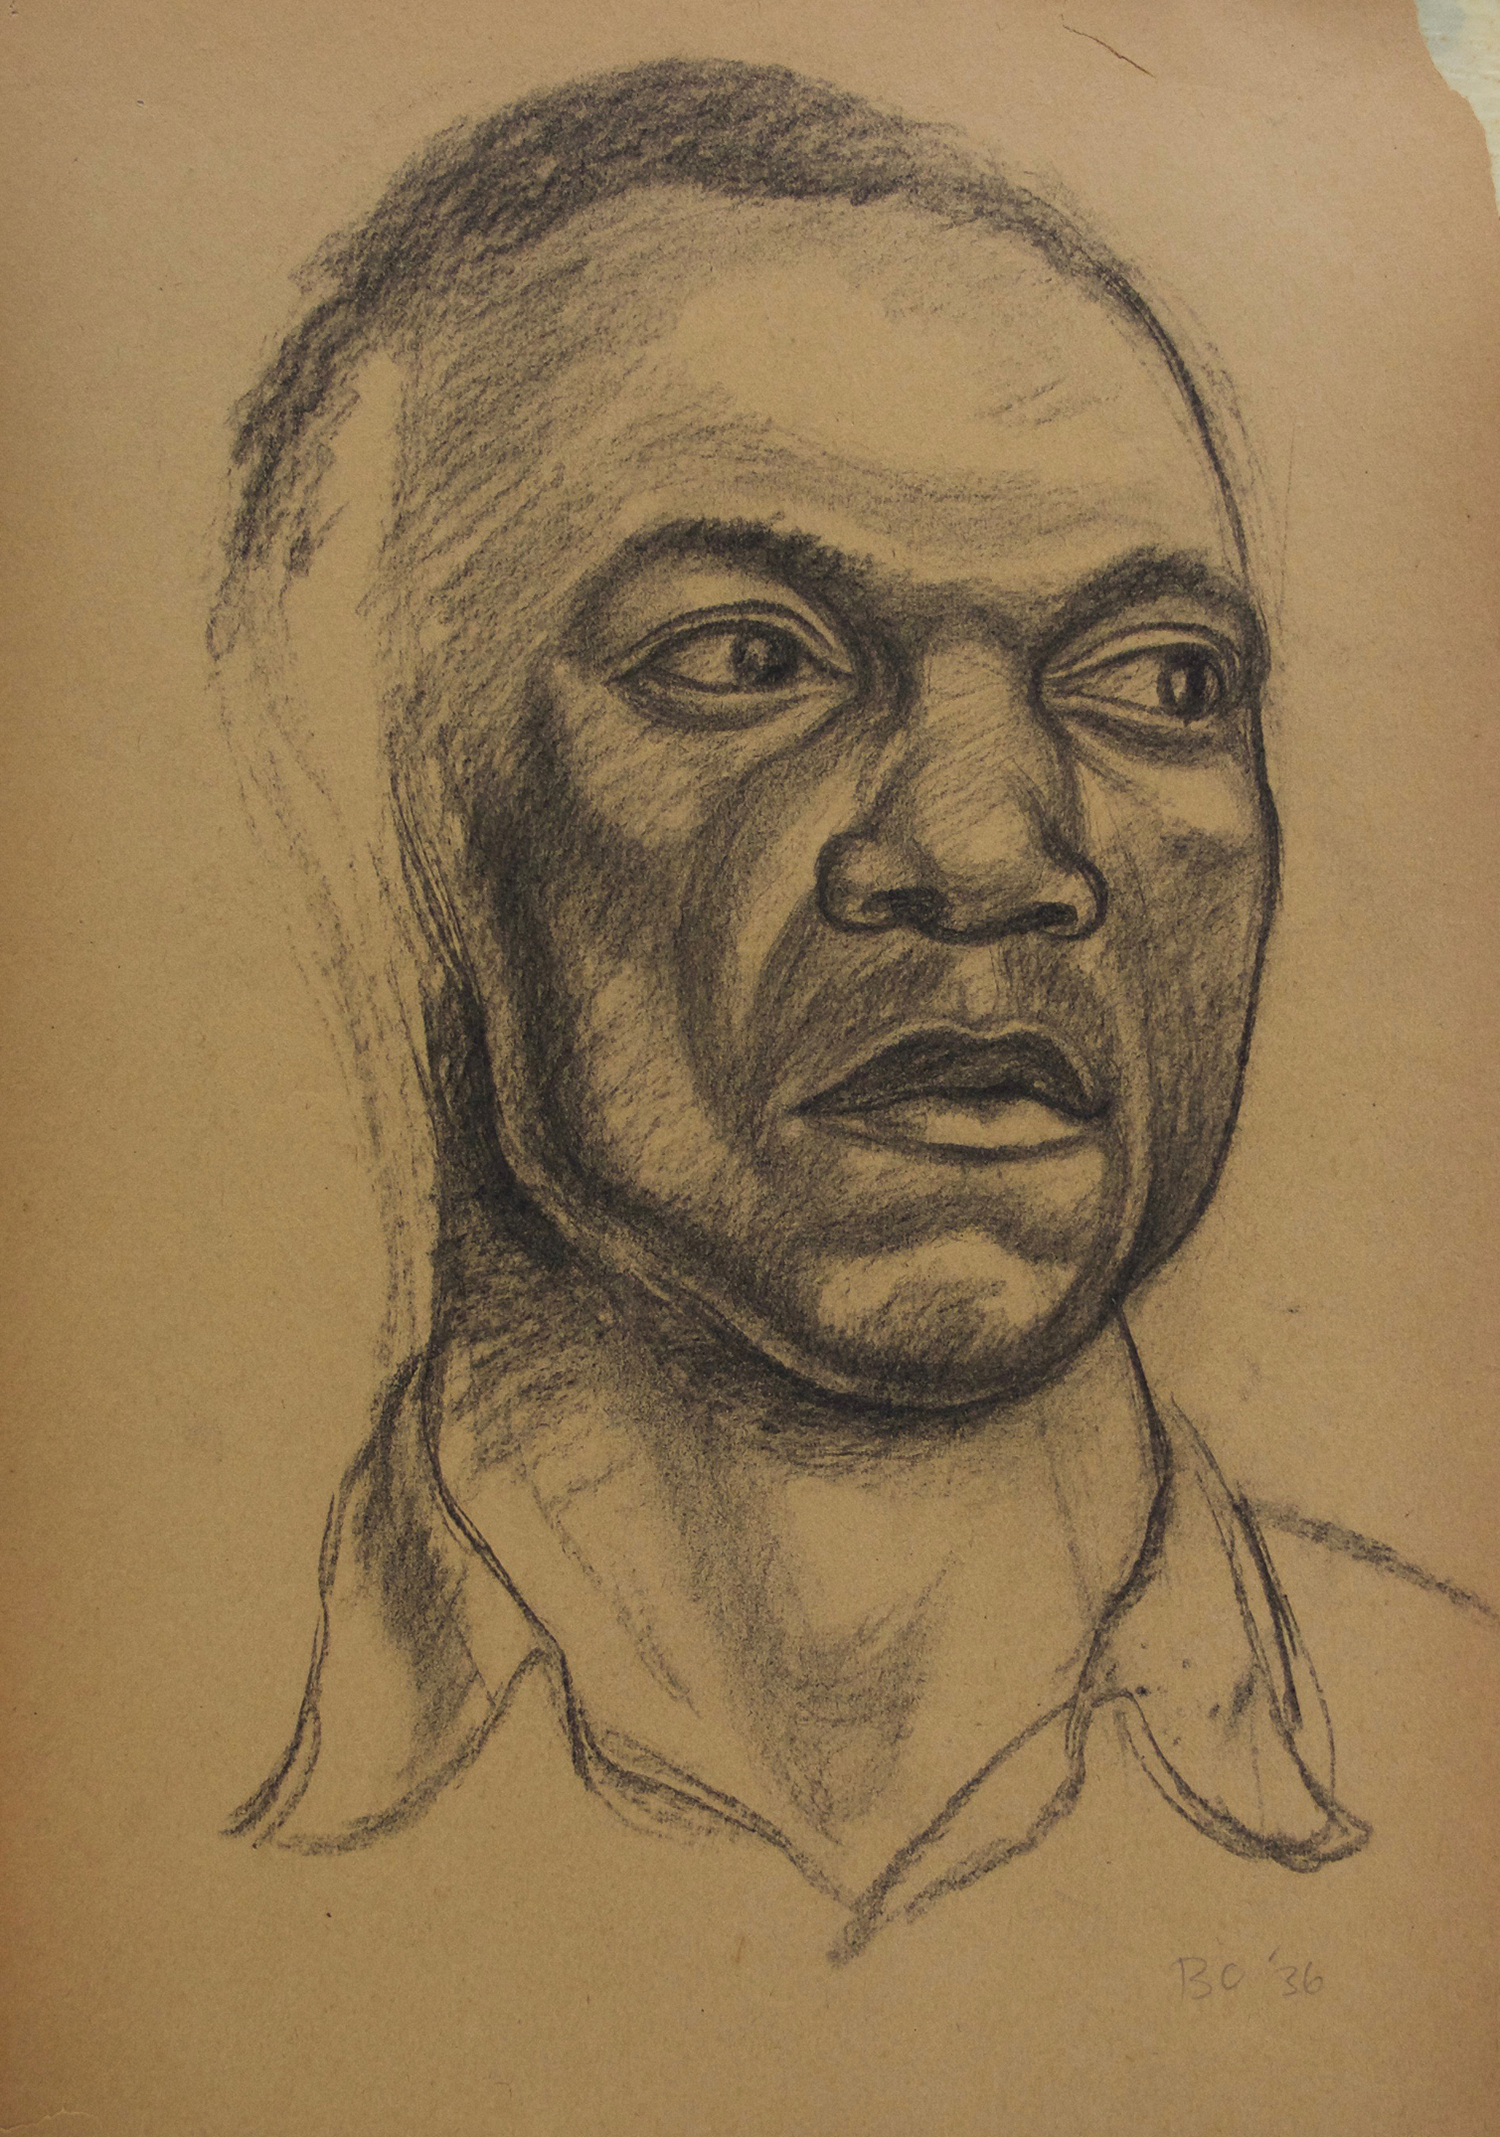 Photo: Burton Callicott, Untitled (Man?s Face), charcoal on paper, 18? x 12?, 1936